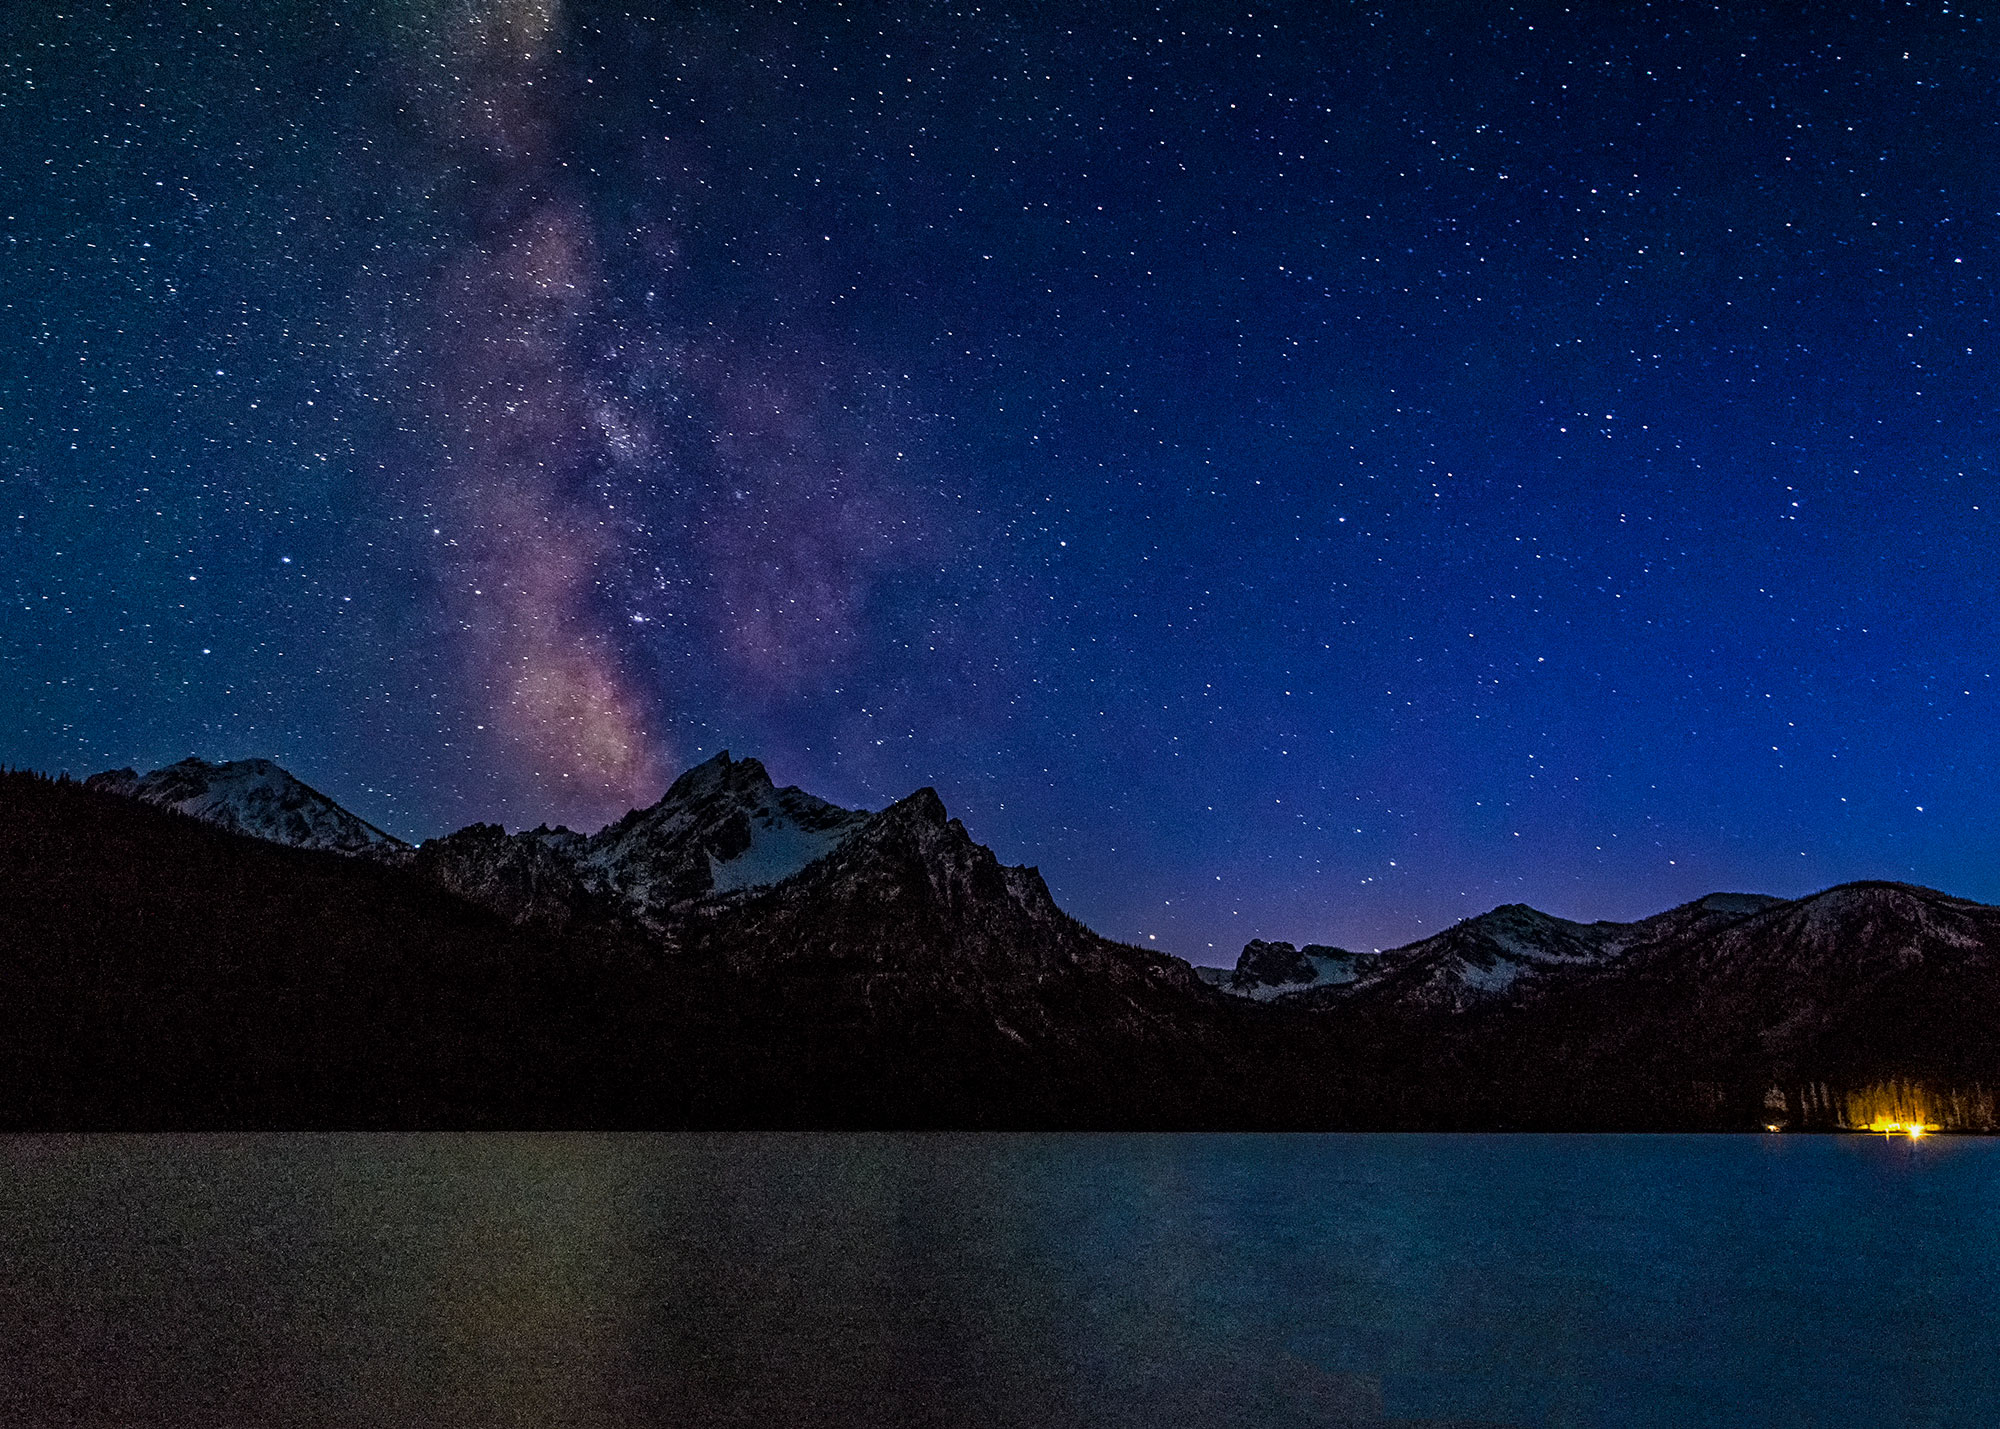 Star Gazing Paradise: Idaho Awarded First US 'Dark Sky Reserve'